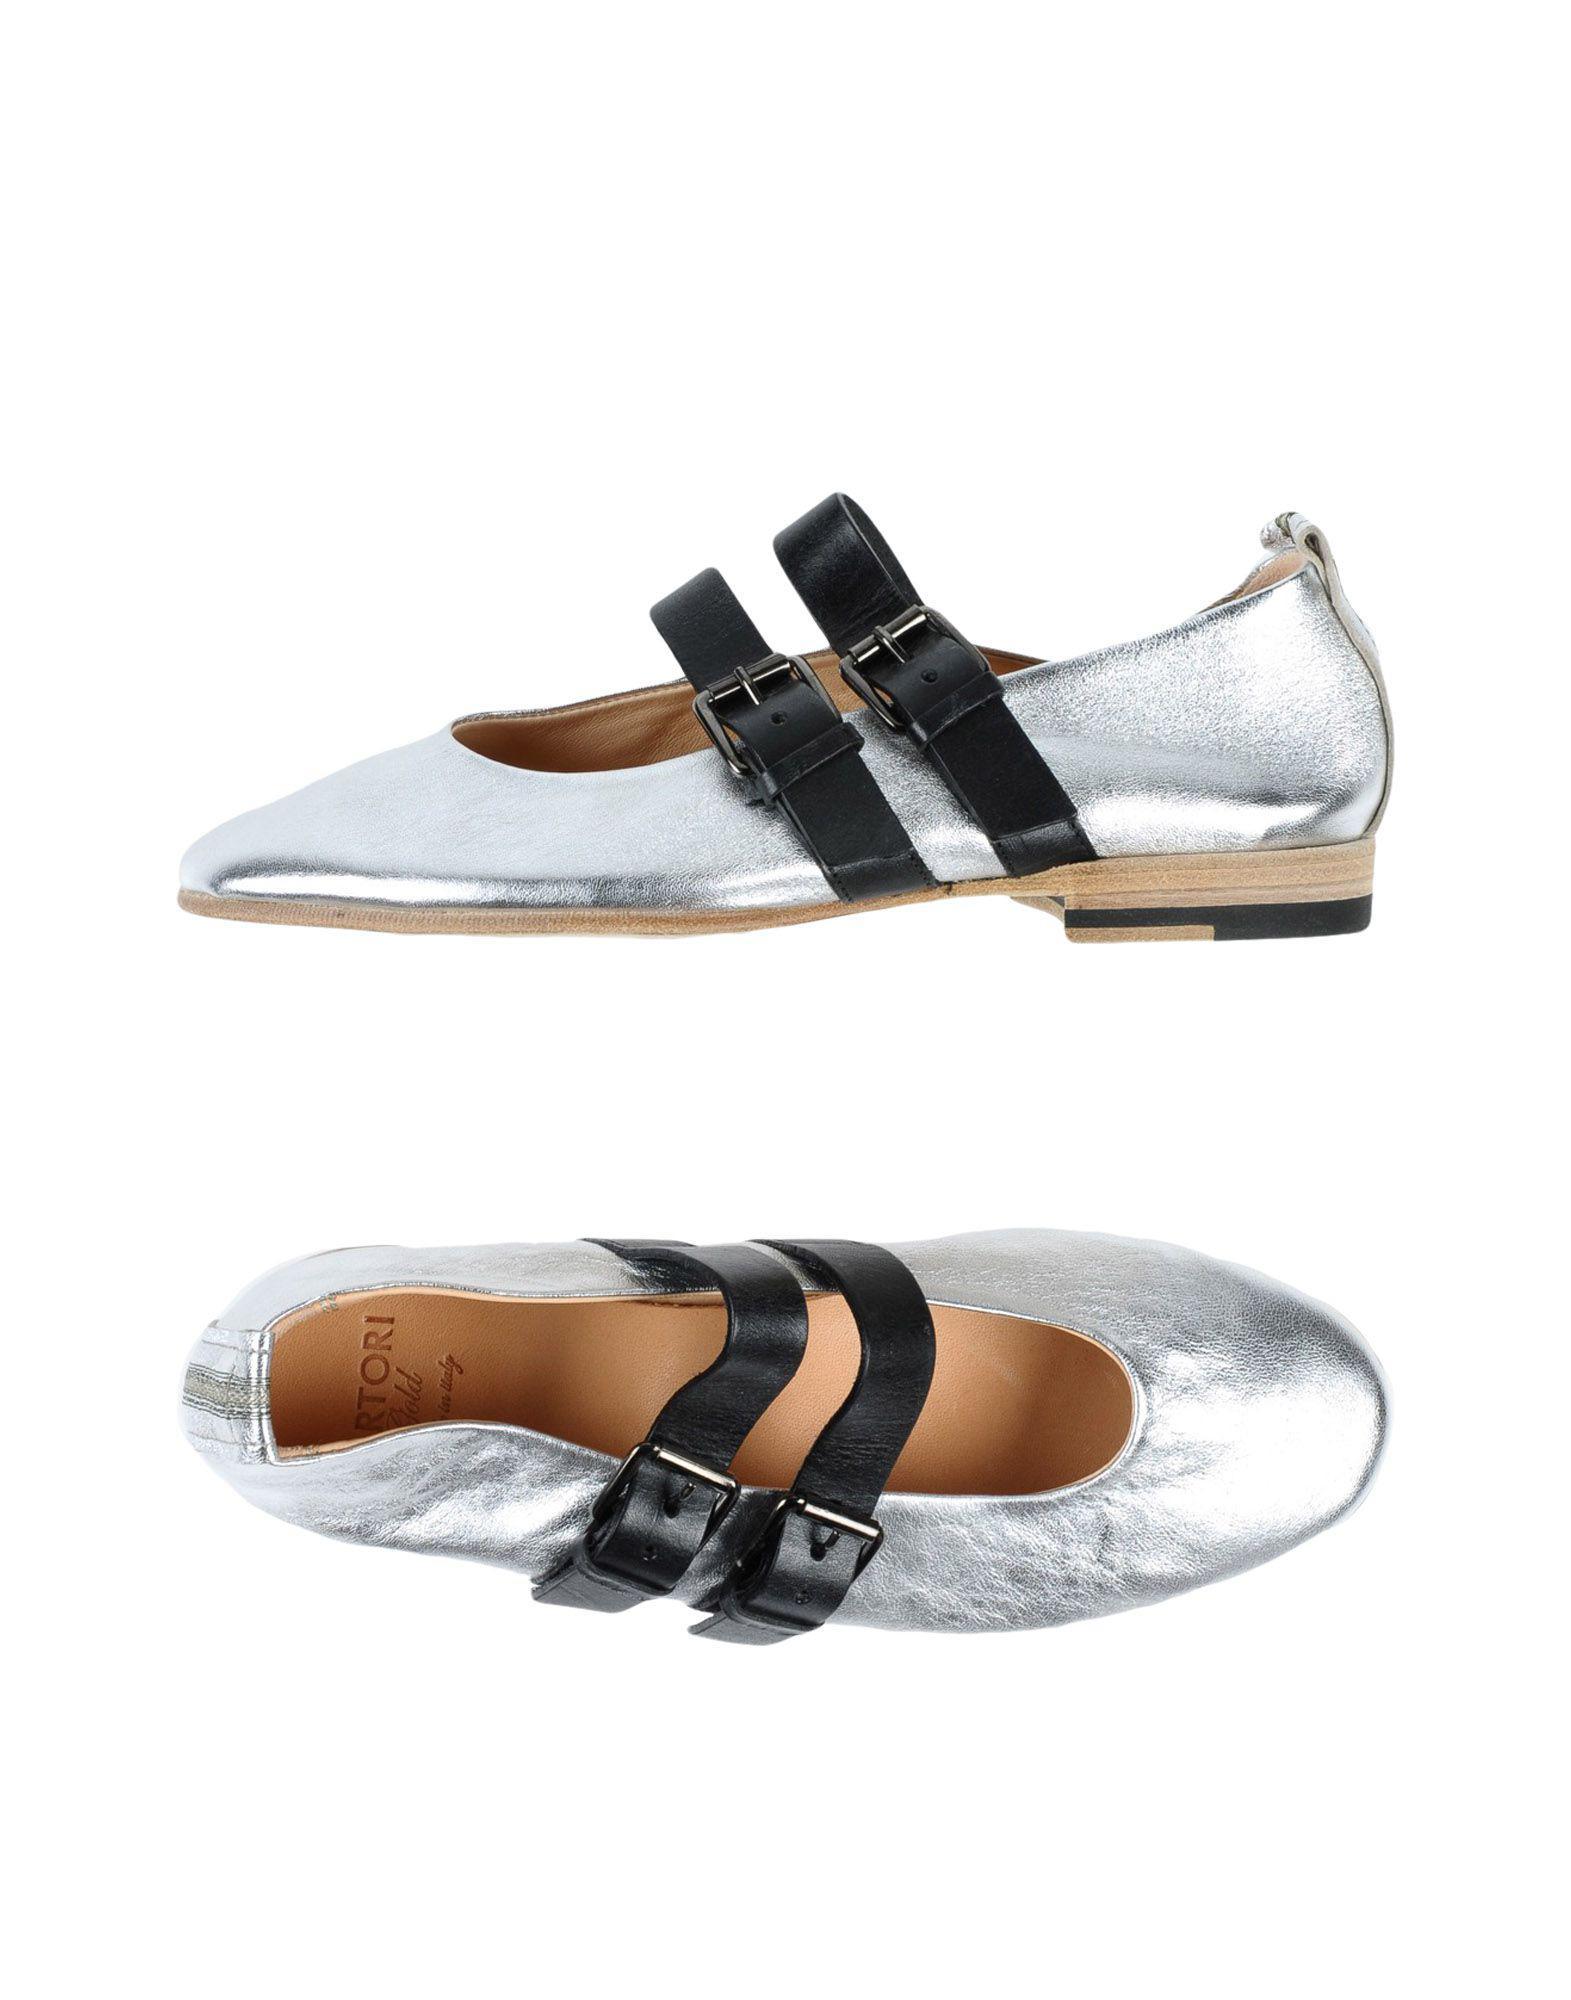 lowest price for sale SARTORI GOLD Ballet flats outlet shop offer buy cheap 2015 under 50 dollars best place sale online SOLenV1h8